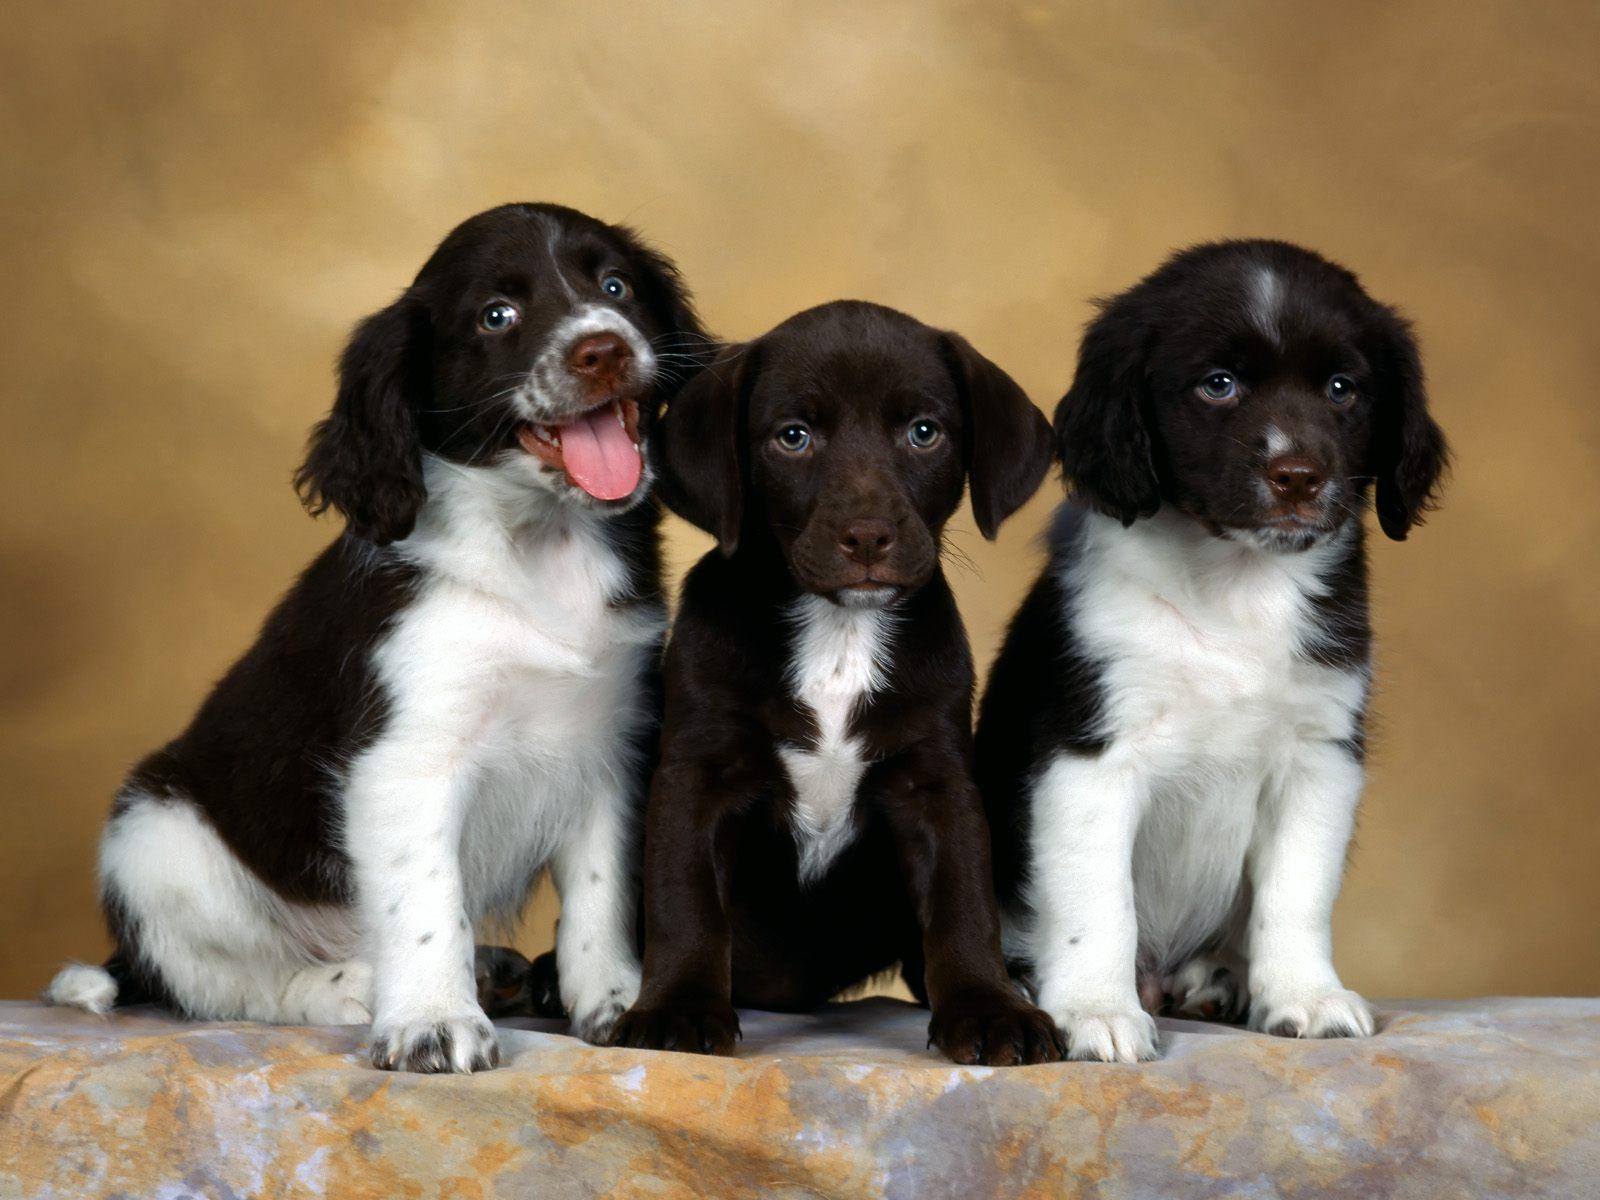 Three English Springer Spaniel puppies wallpaper